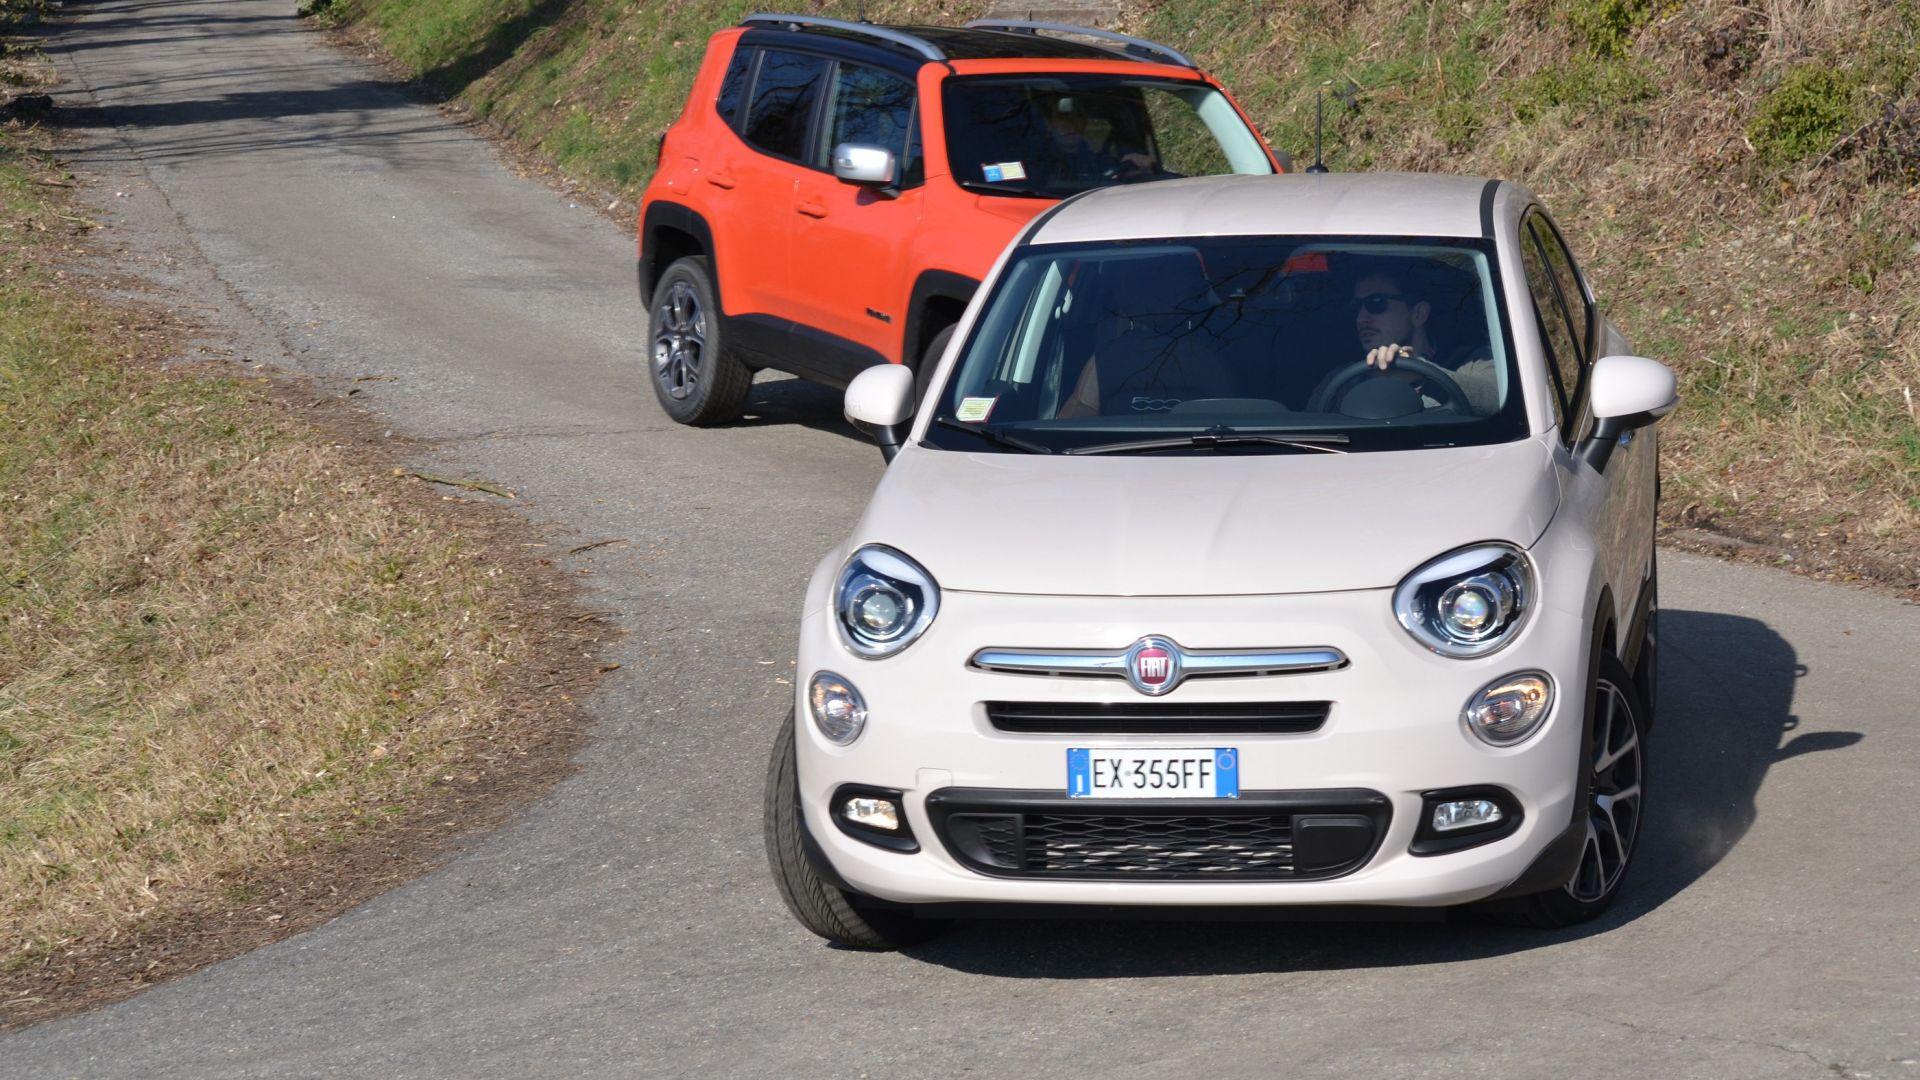 Cherokee Vs Grand Cherokee >> Video confronto: Fiat 500X vs Jeep Renegade vs Dacia Duster - MotorBox